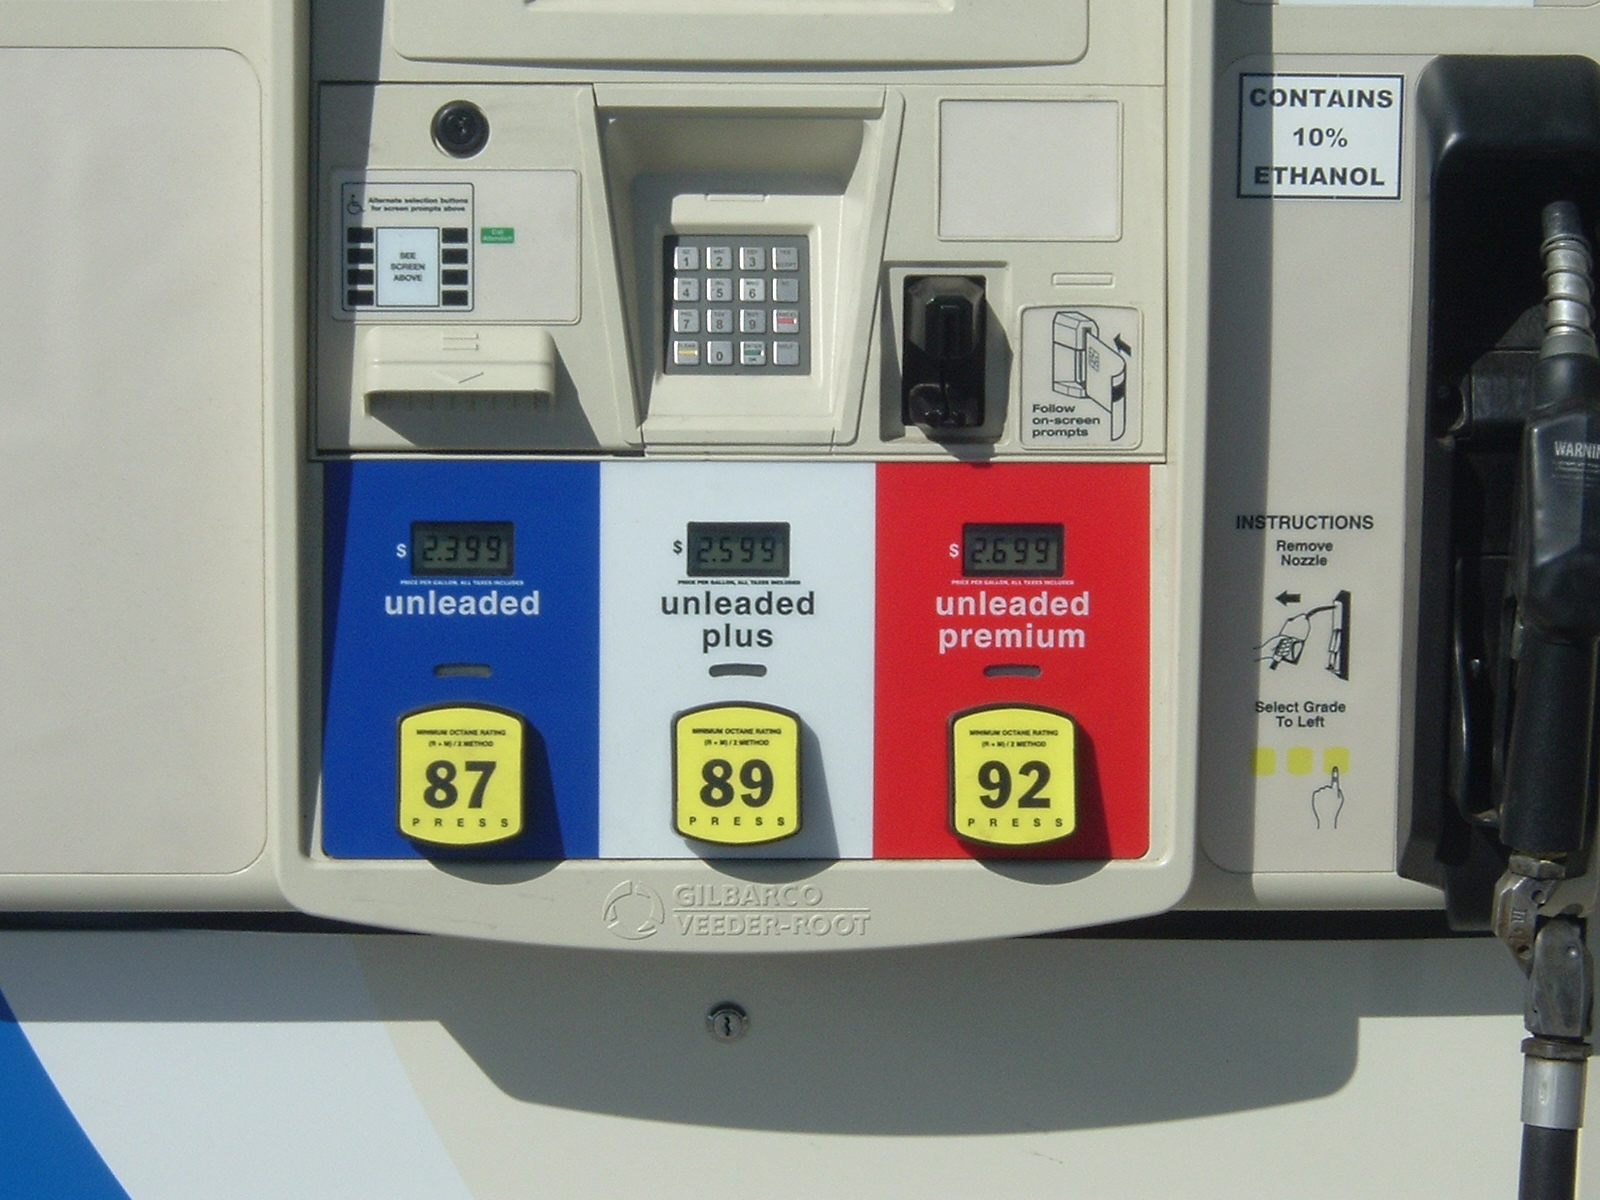 Top Tier Detergent Gasoline >> Should I Be Buying Premium Fuel Dave S Import Service Auto